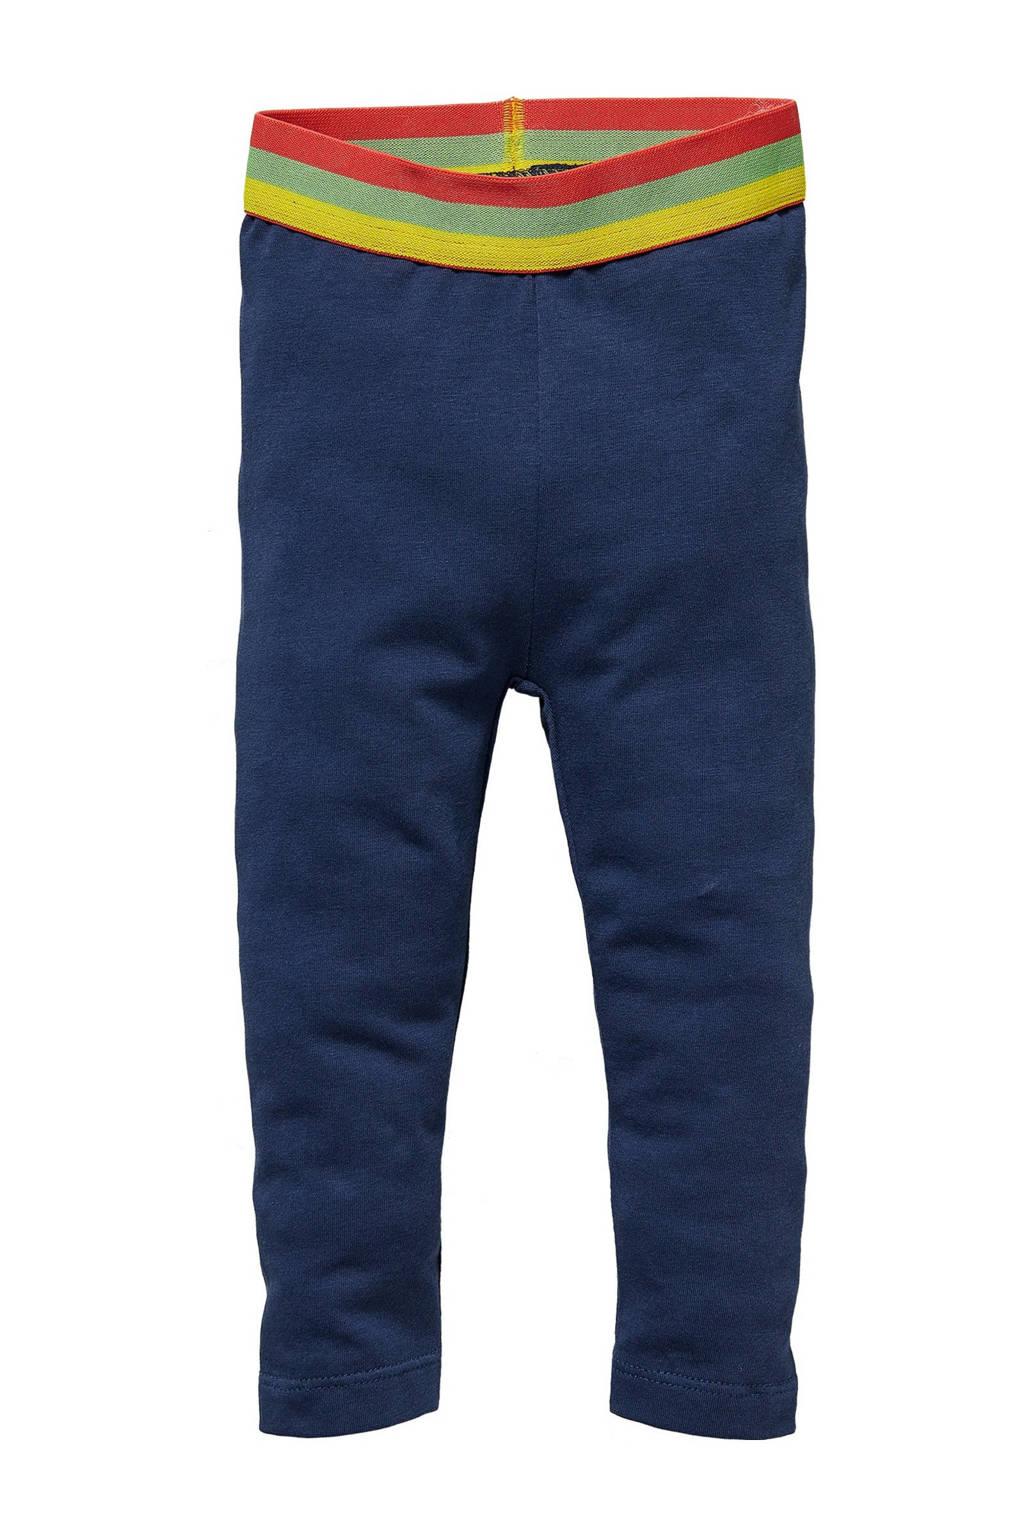 Quapi Mini regular fit legging Gwen donkerblauw, Donkerblauw